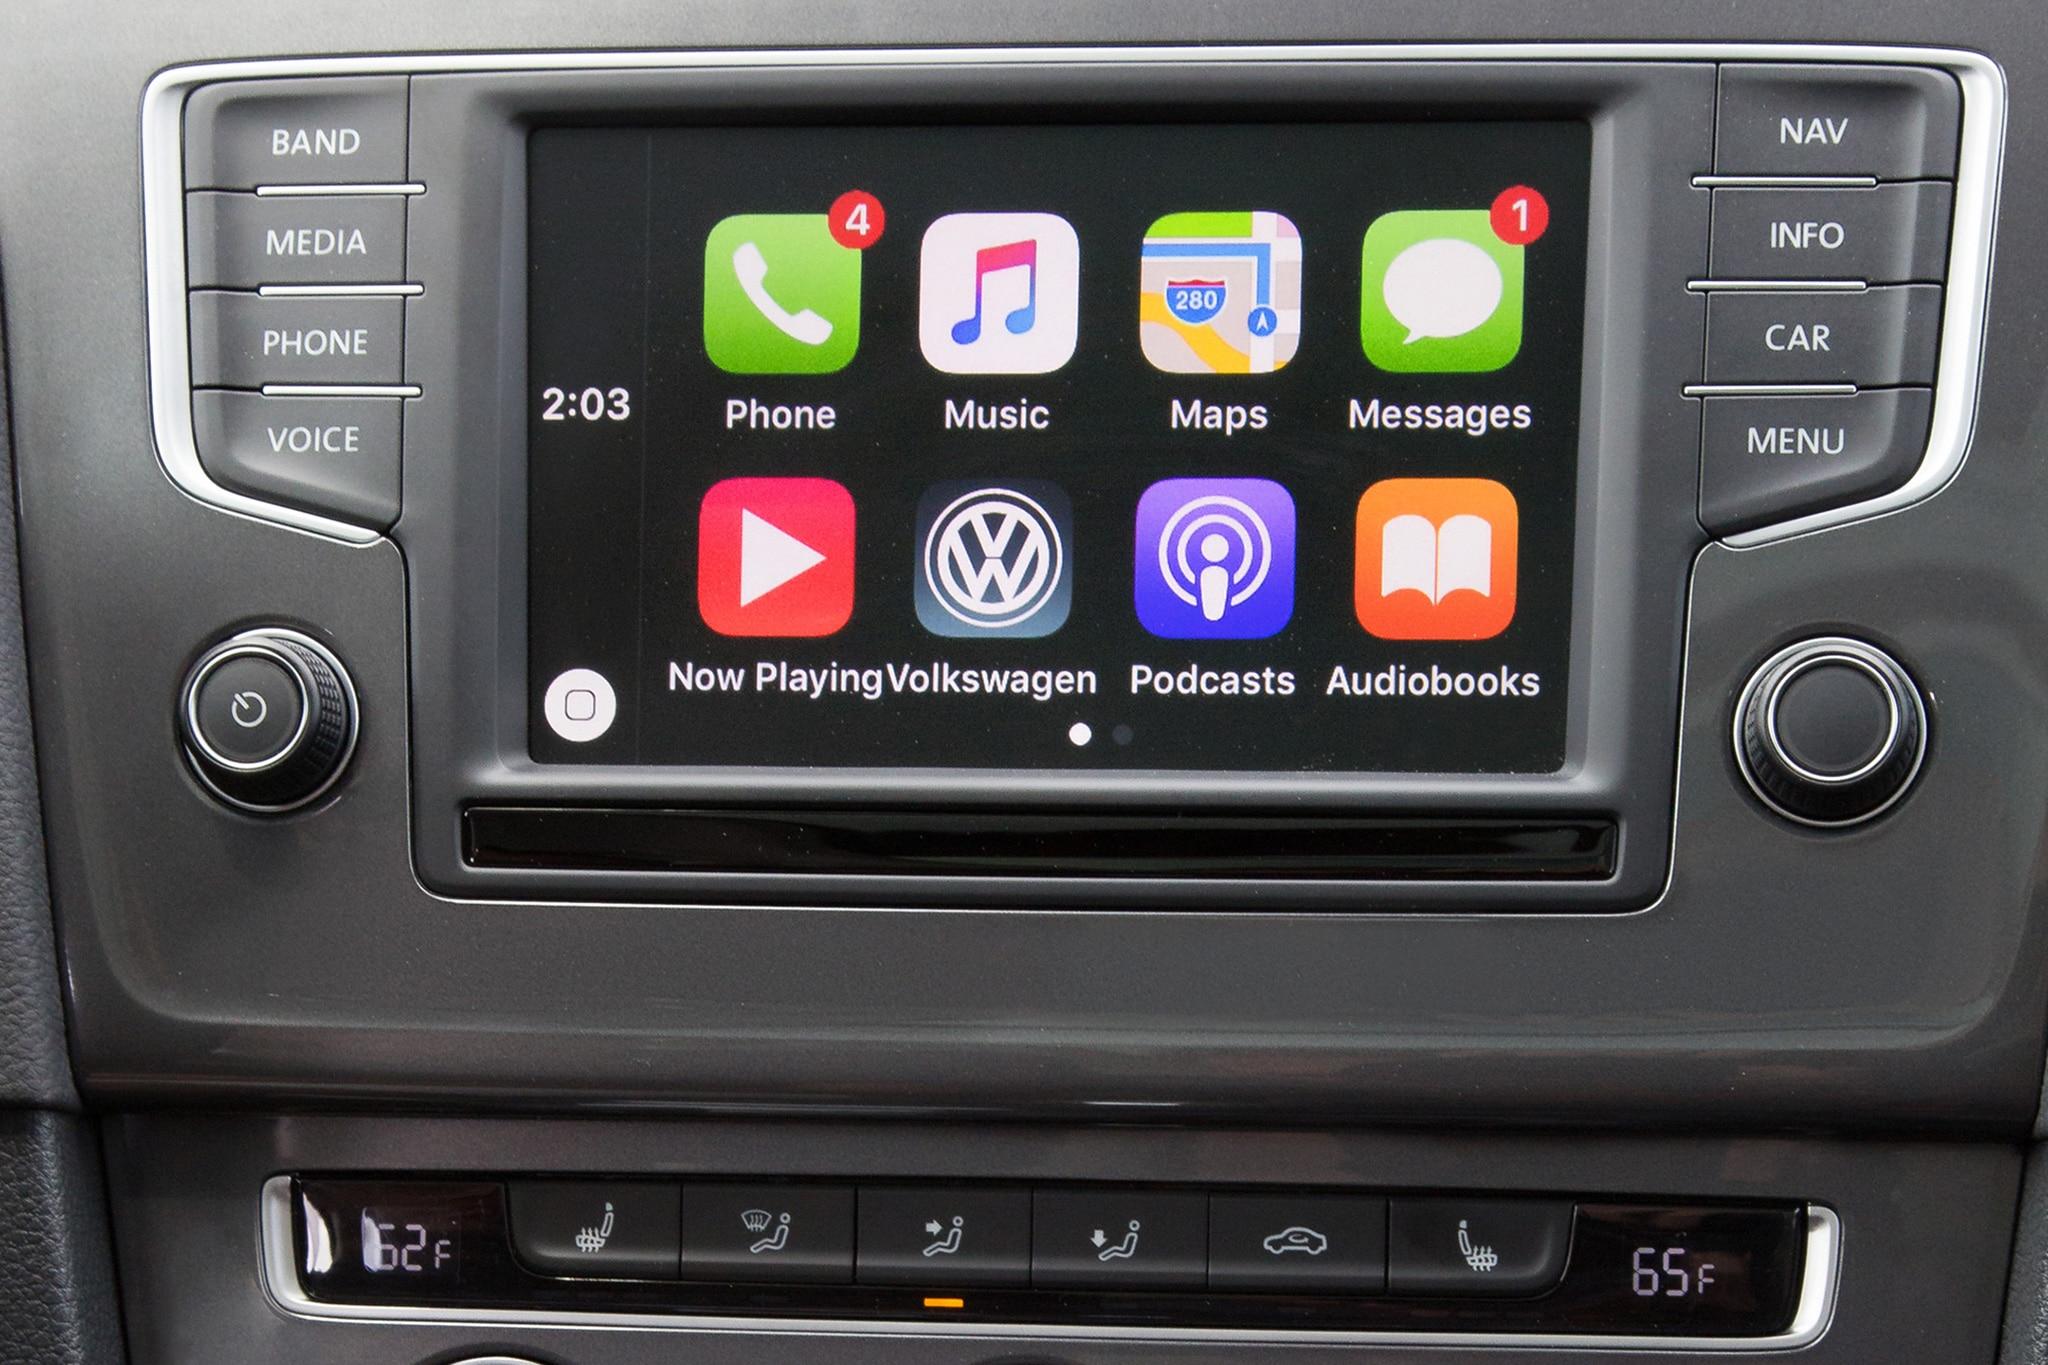 2017 Volkswagen Golf Sportwagen Tsi S >> 2017 Volkswagen Golf Alltrack First Drive Review ...